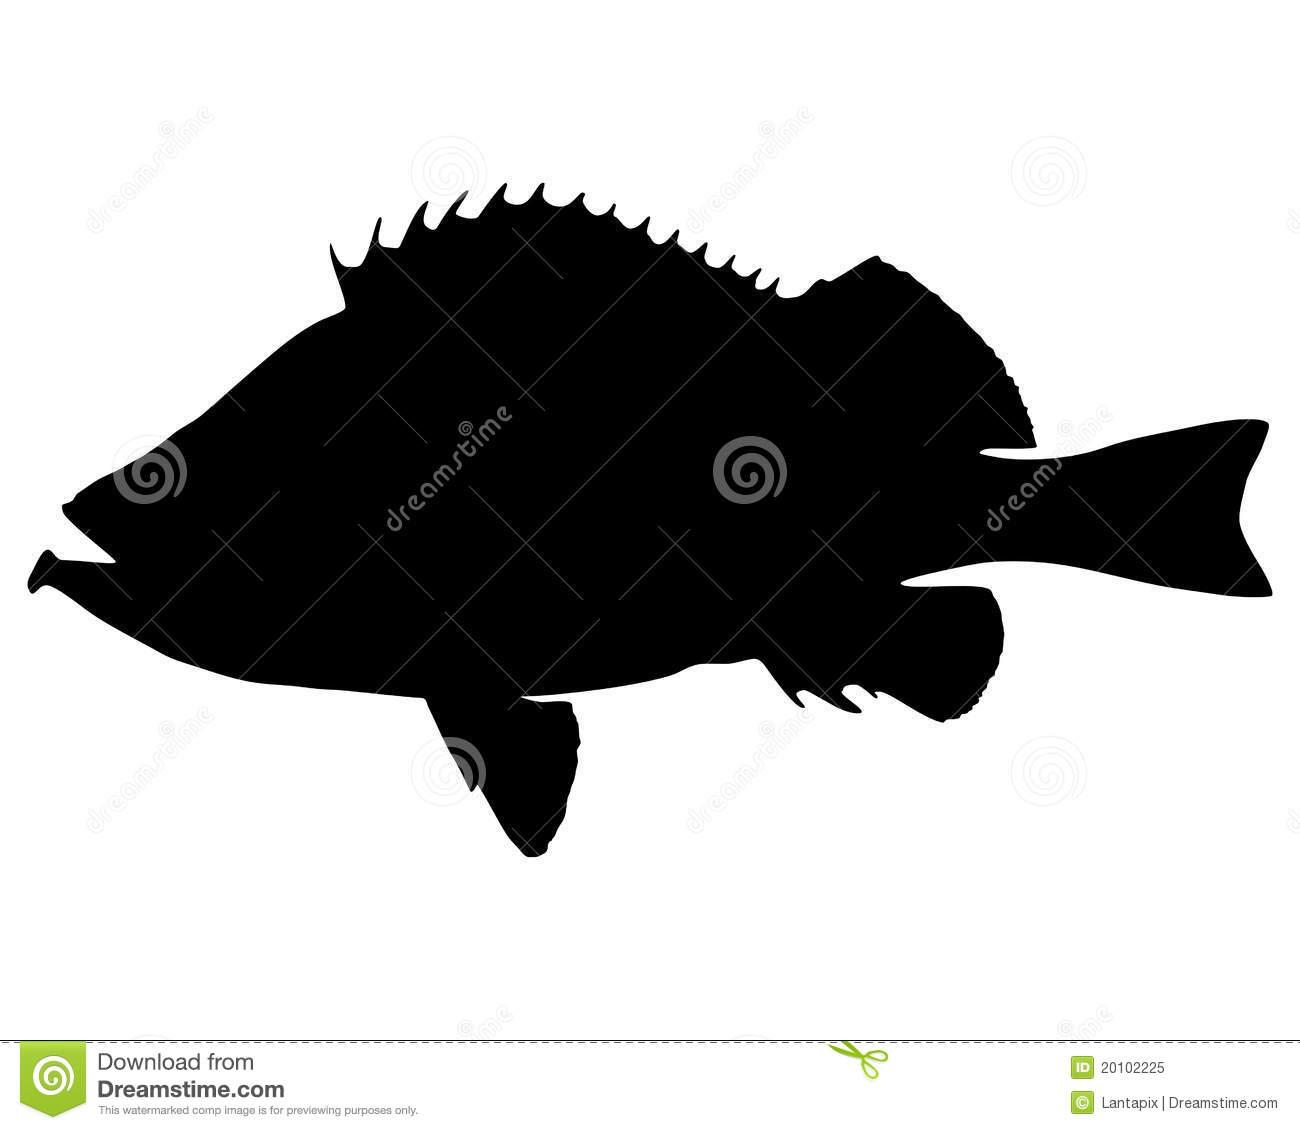 Sebastes marinus clipart #12